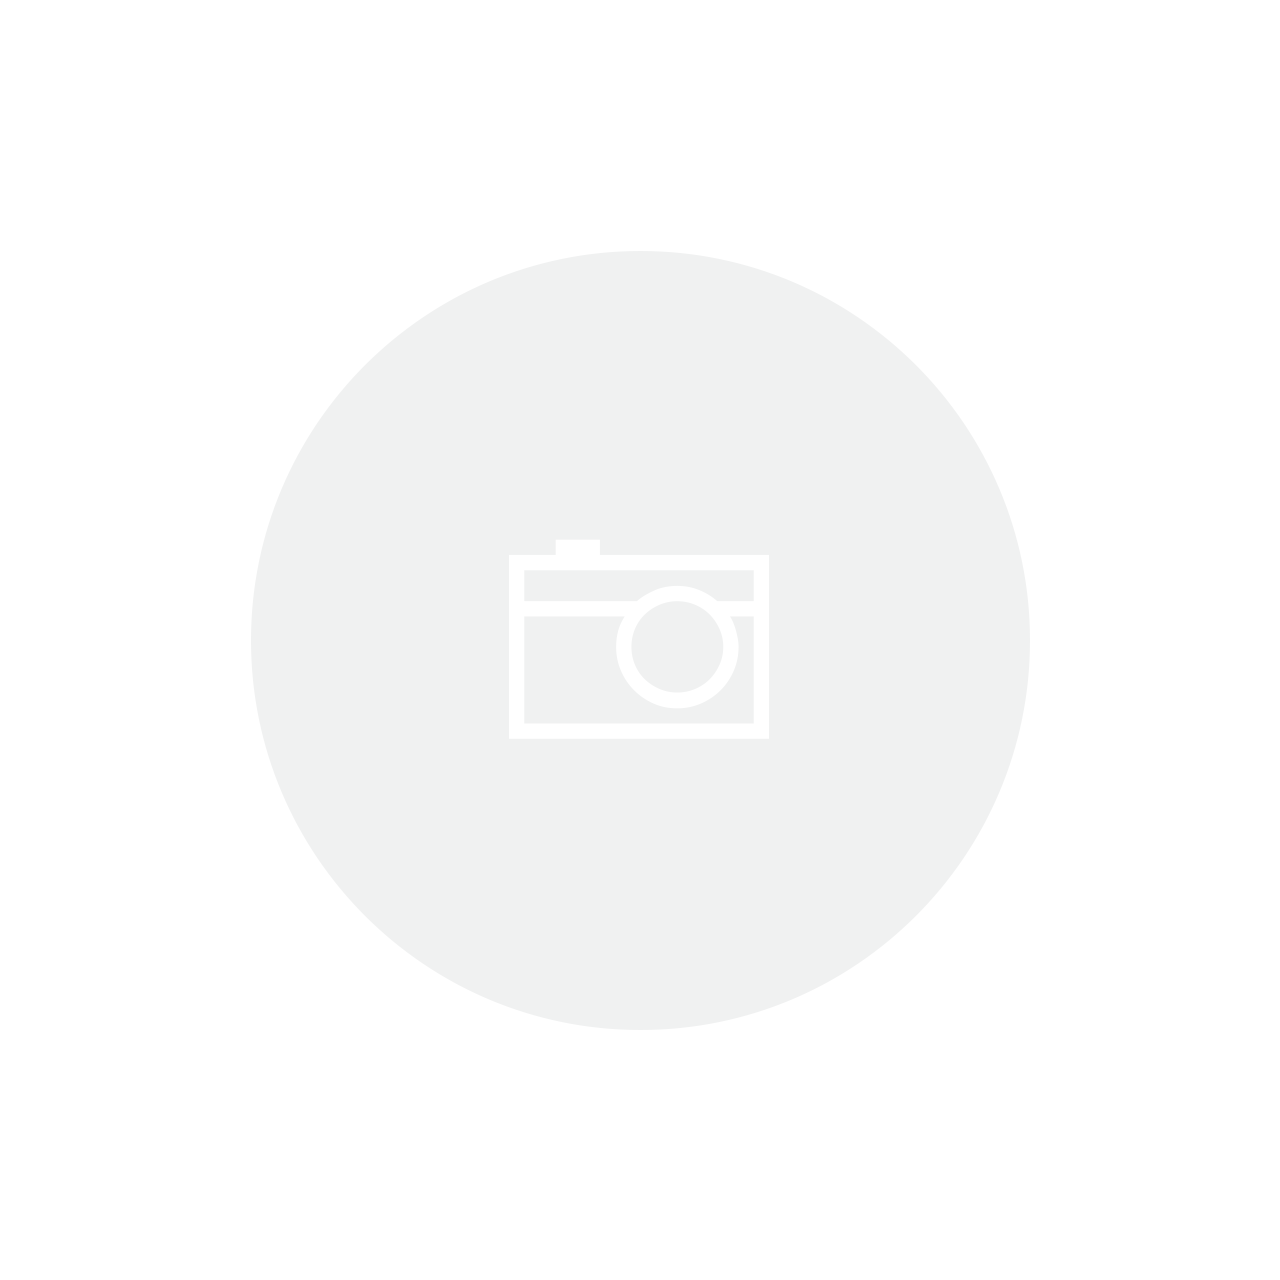 Fruteira Selene 22Cm Vidro c/ pé gs Comercio Internacional l